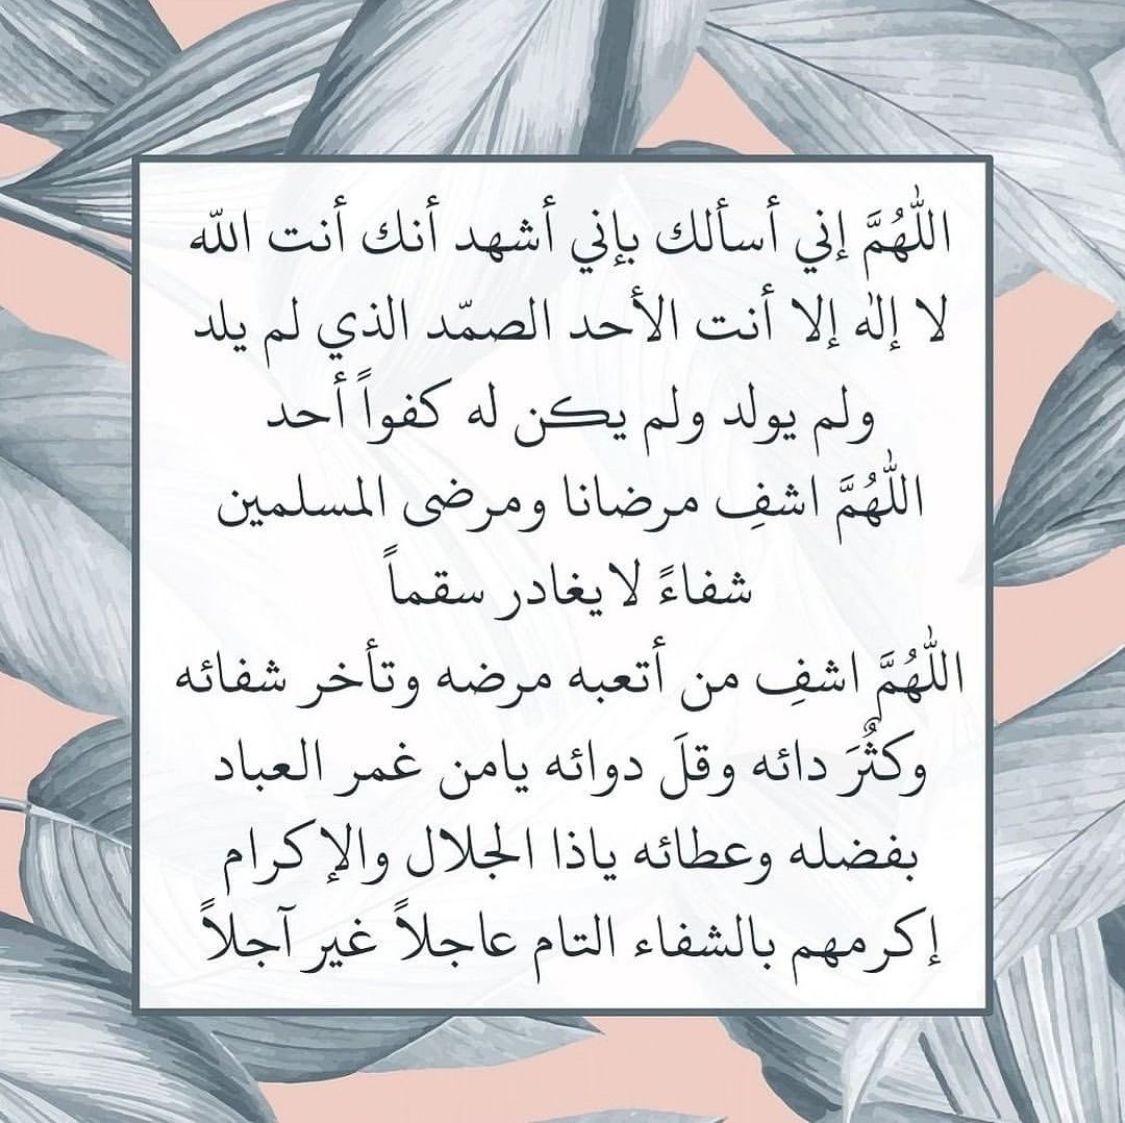 Epingle Par Amine Belyazid Sur Duea دعاء Doua Islam Islam Doua